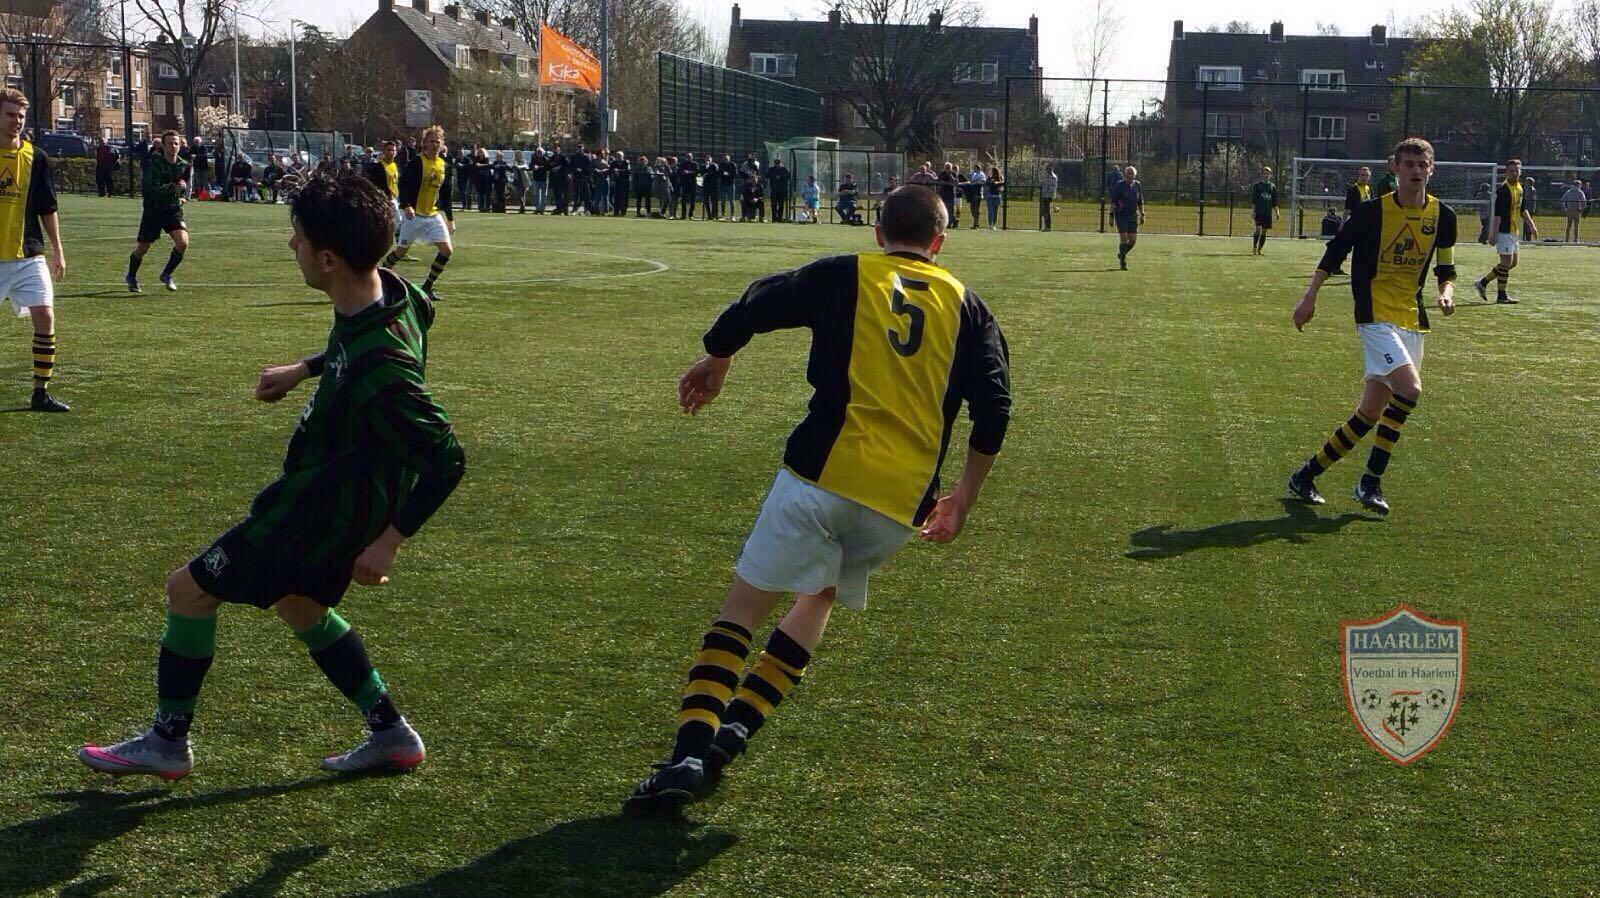 Alliance '22 - Schoten - Voetbal in Haarlem